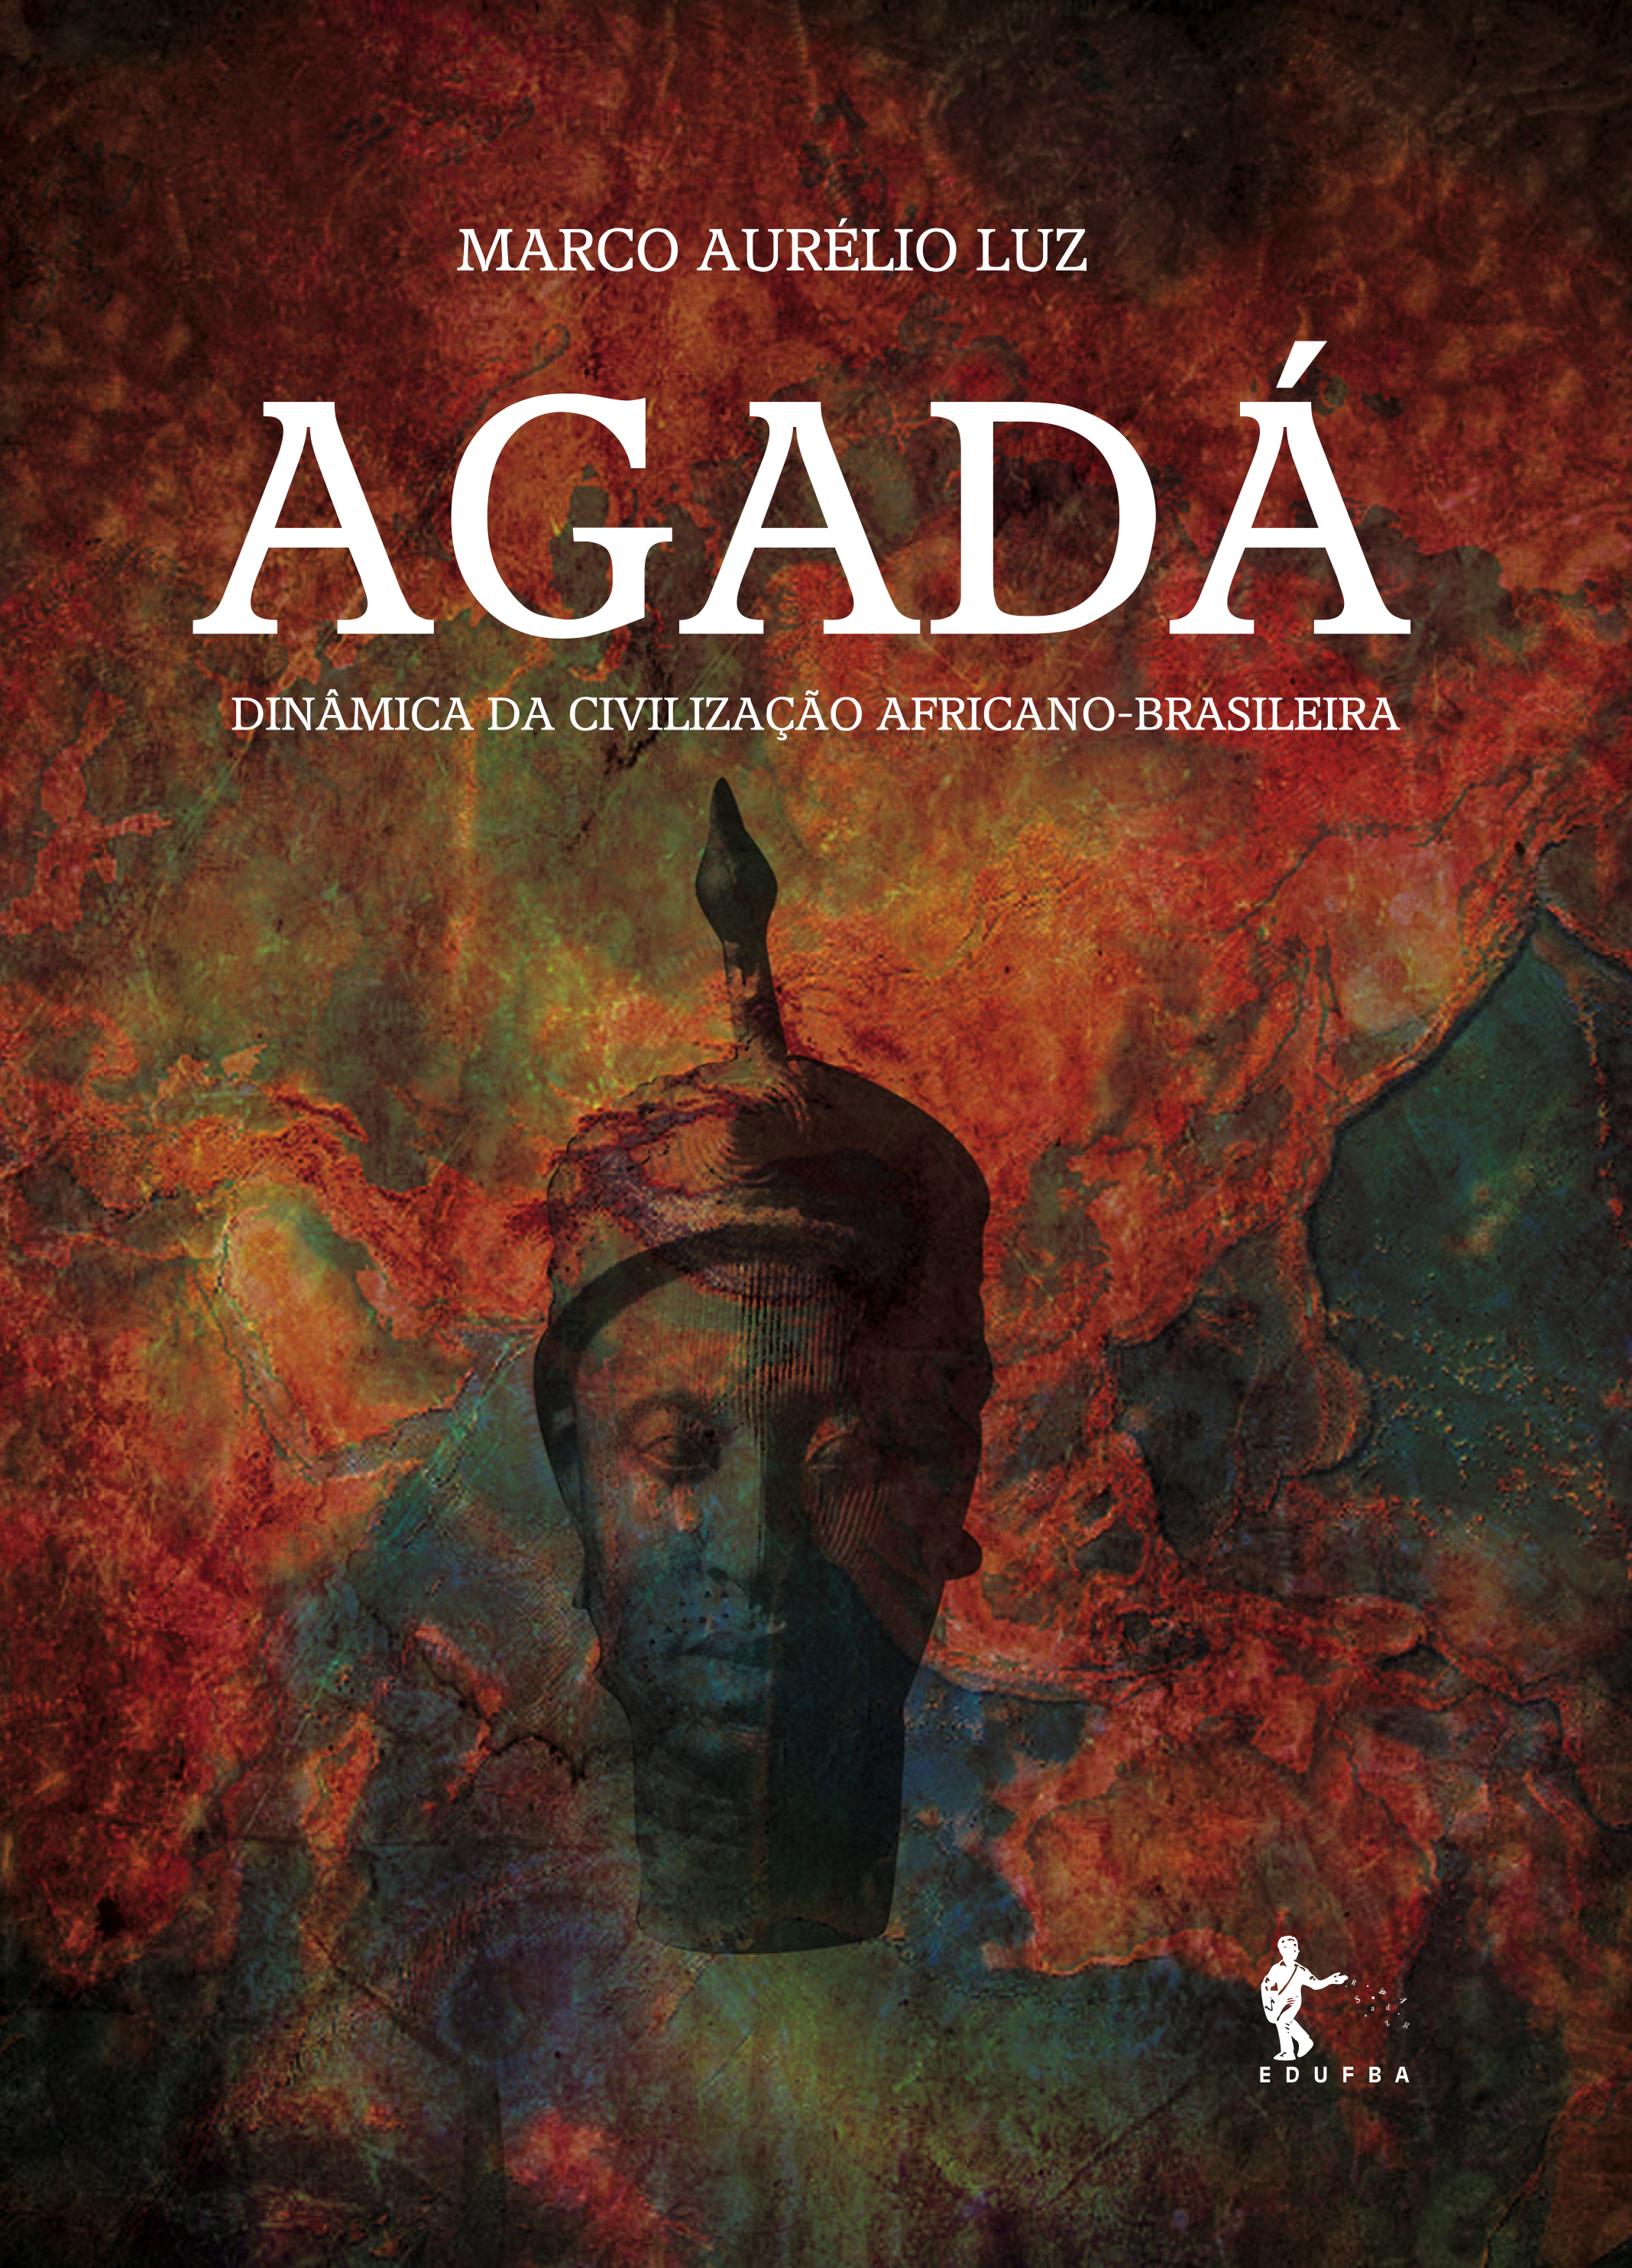 Agada: Dinamica Da Civilizacao Africano-Brasileira, livro de Marco Aurelio Luz